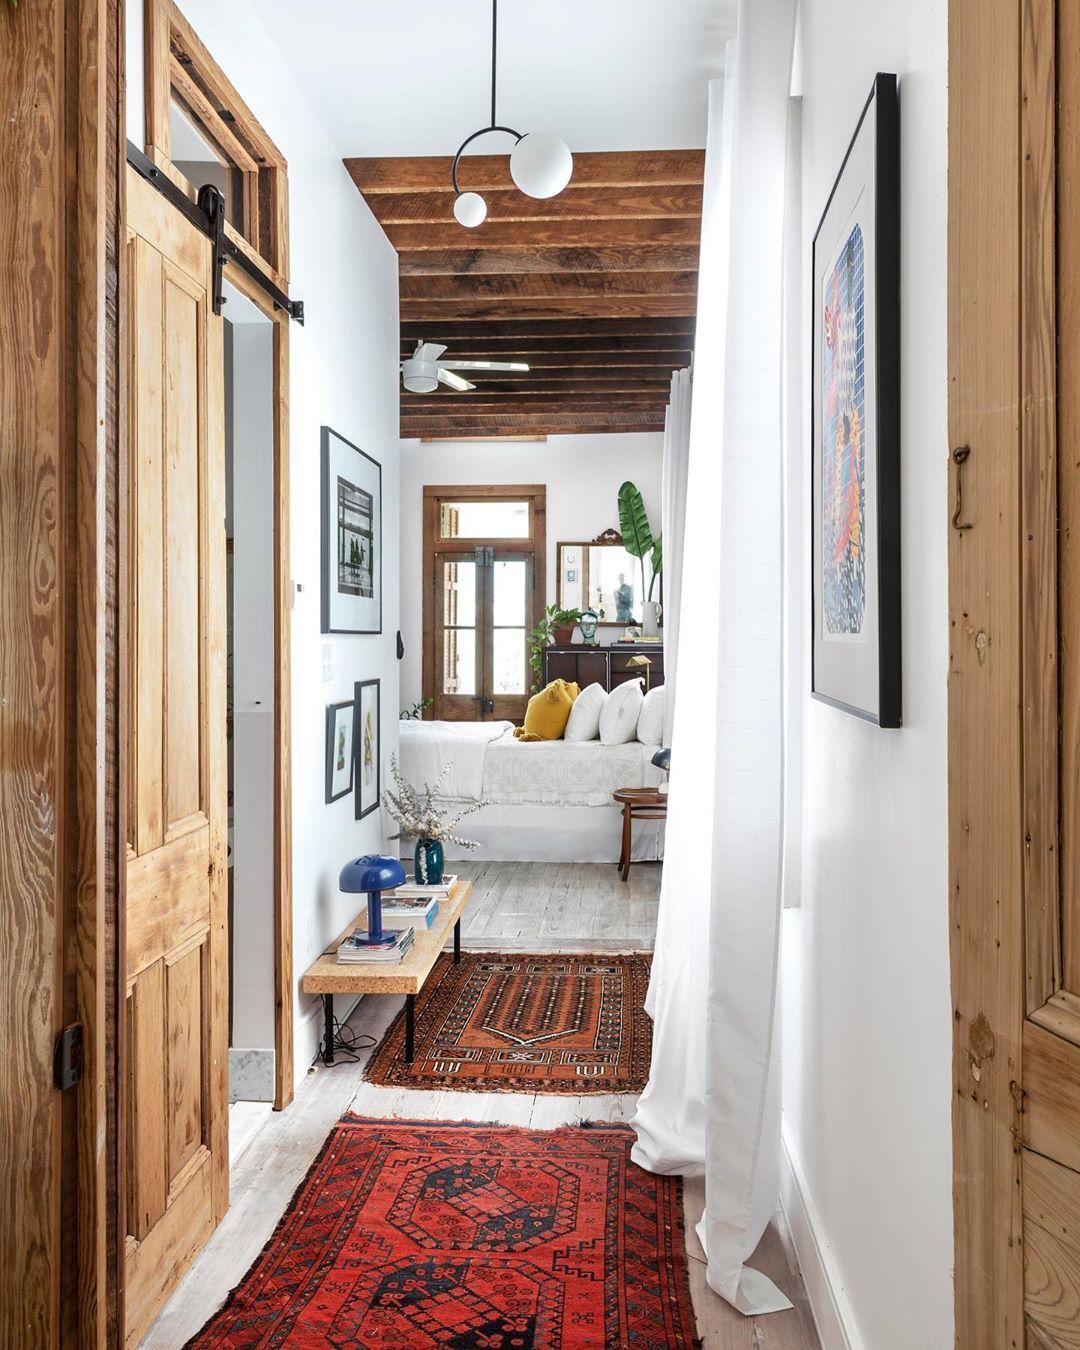 interior decor trends 2020 (11)